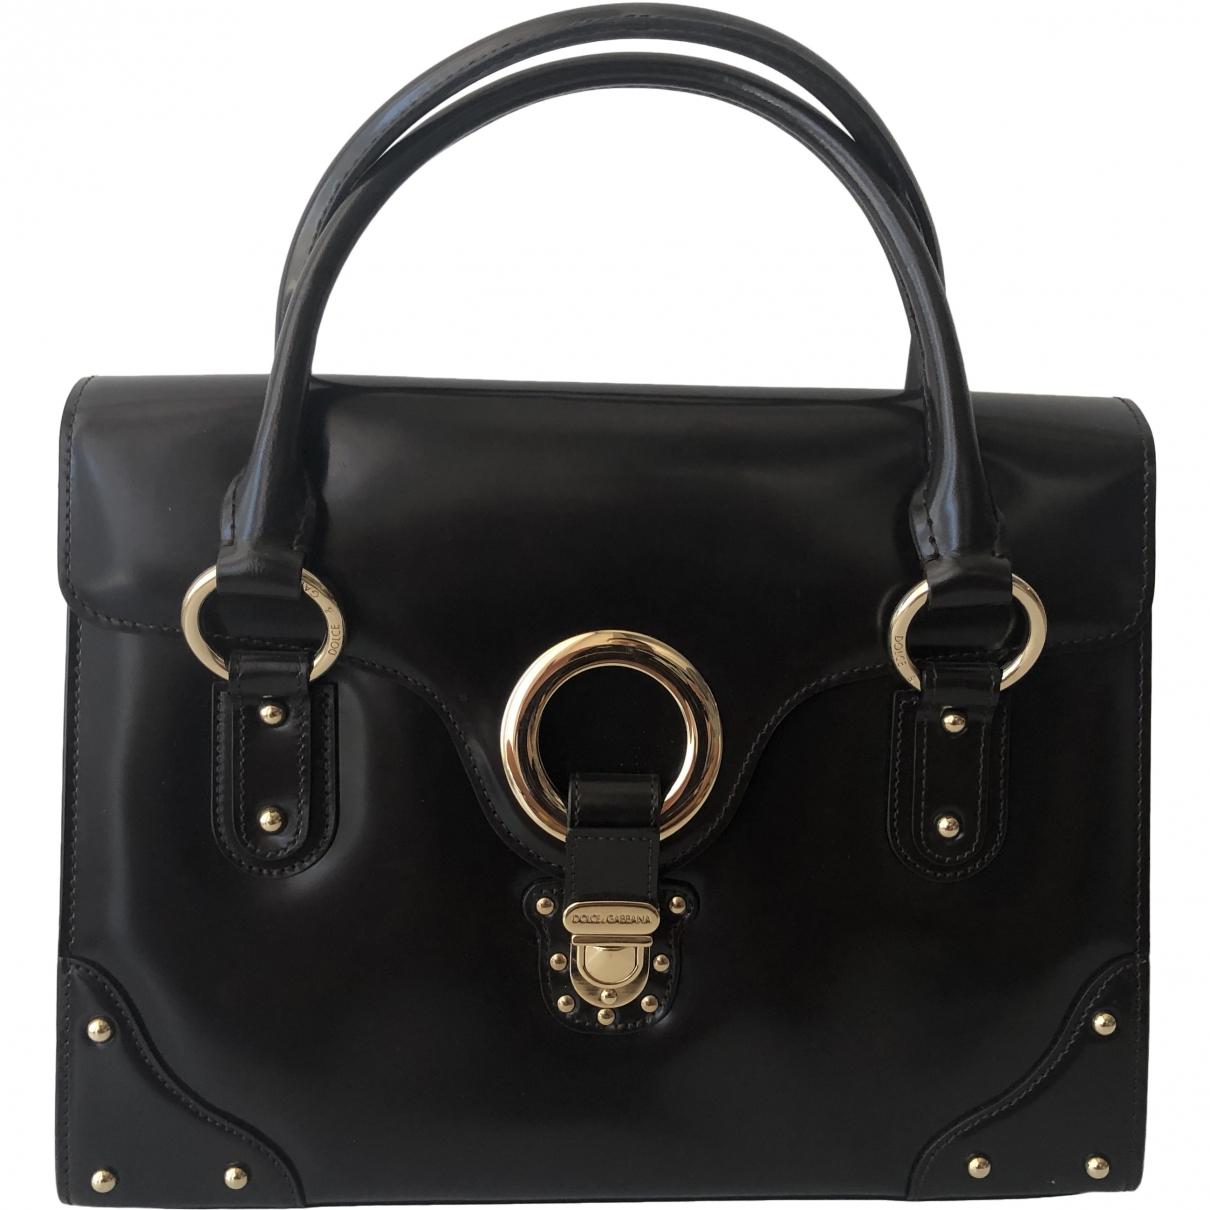 Dolce & Gabbana - Sac a main   pour femme en cuir - marron